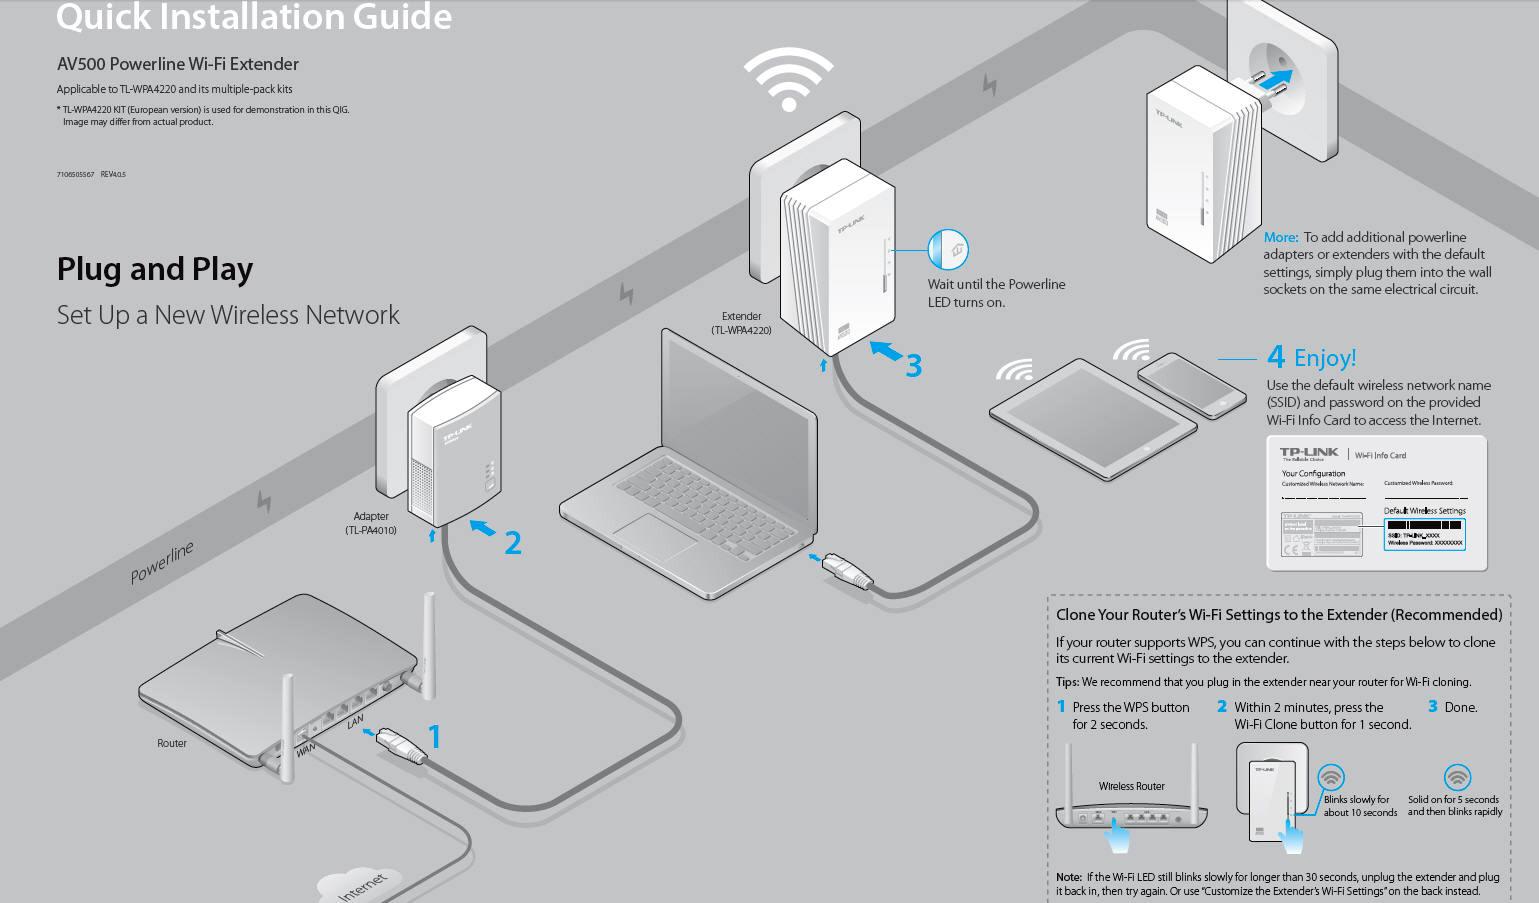 M Rng Sng Wi Fi Qua Ng Dy In Trong Nh Vi Tp Link Tplink Powerline Diagram Hng Dn Ci T V Cng N Gin